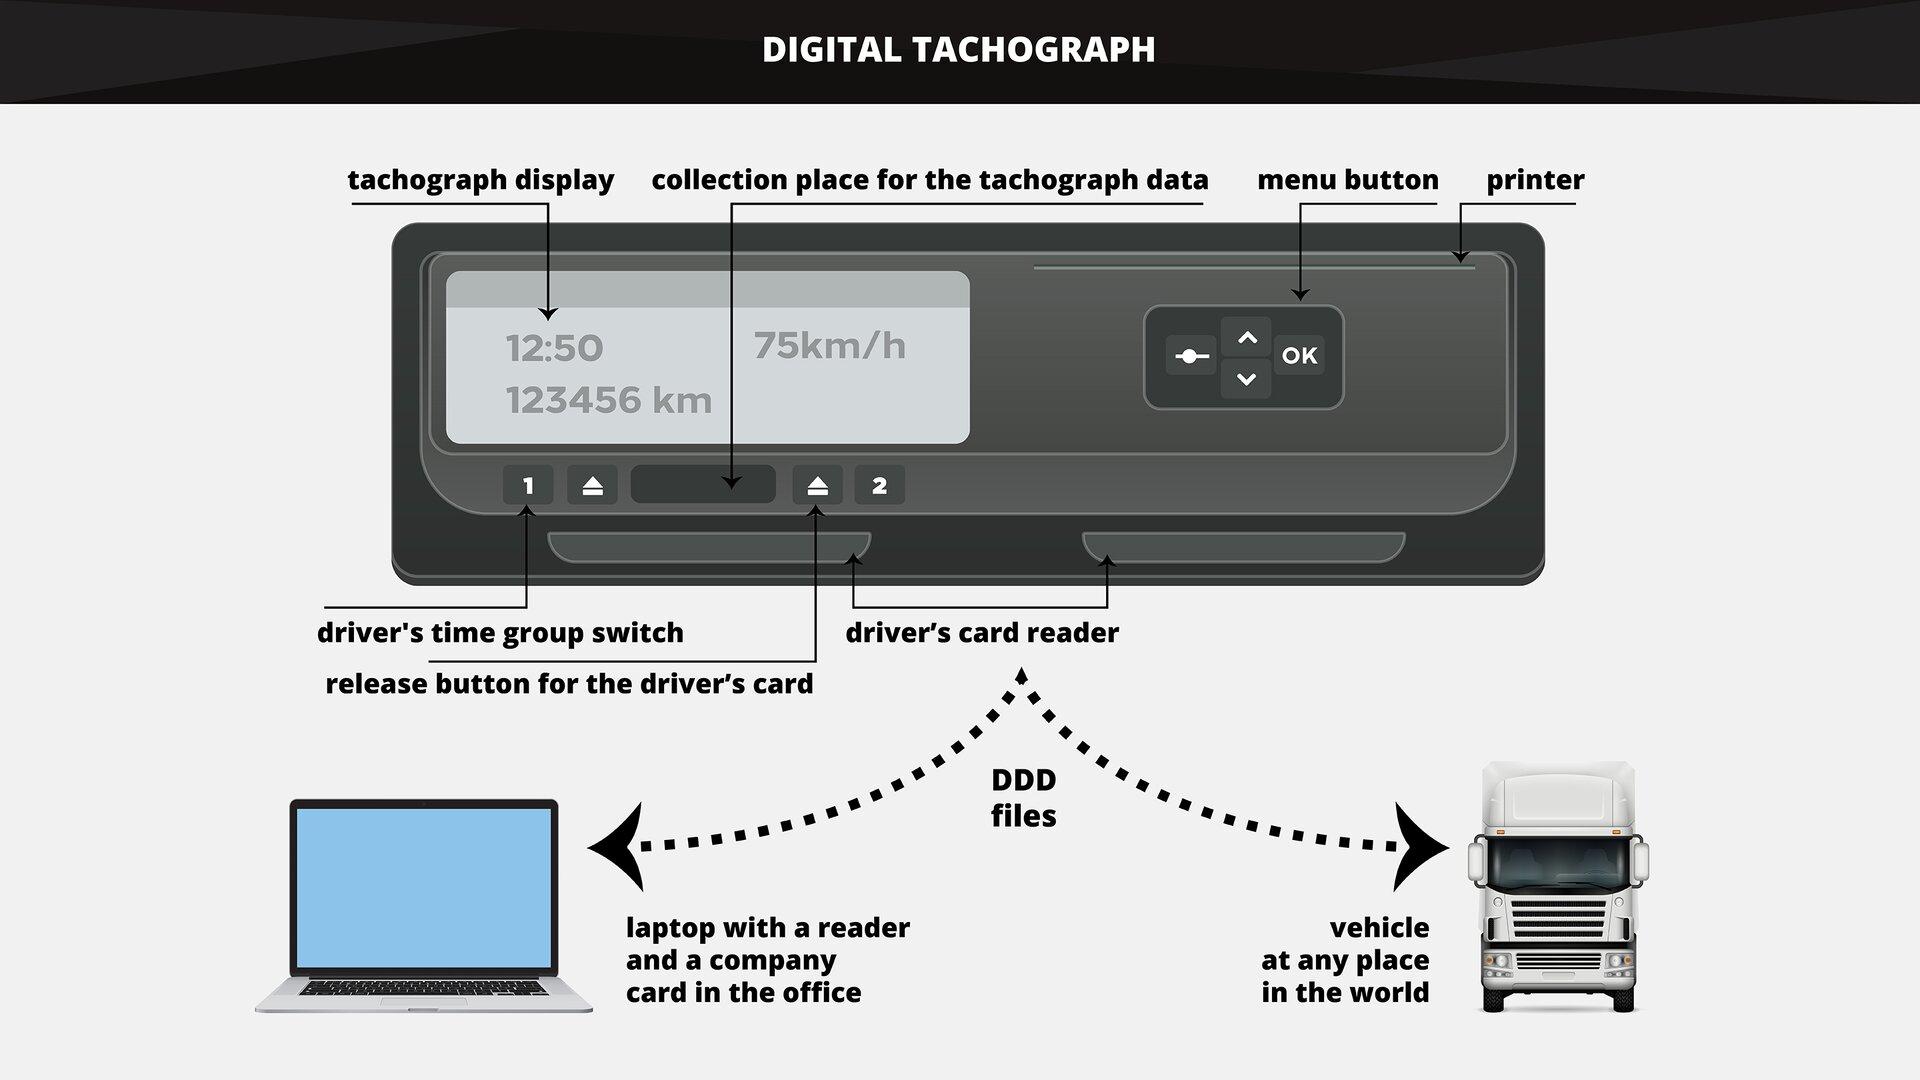 The graphics shows the elements of adigital tachograph. Grafika przedstawia elementy tachografu cyfrowego.